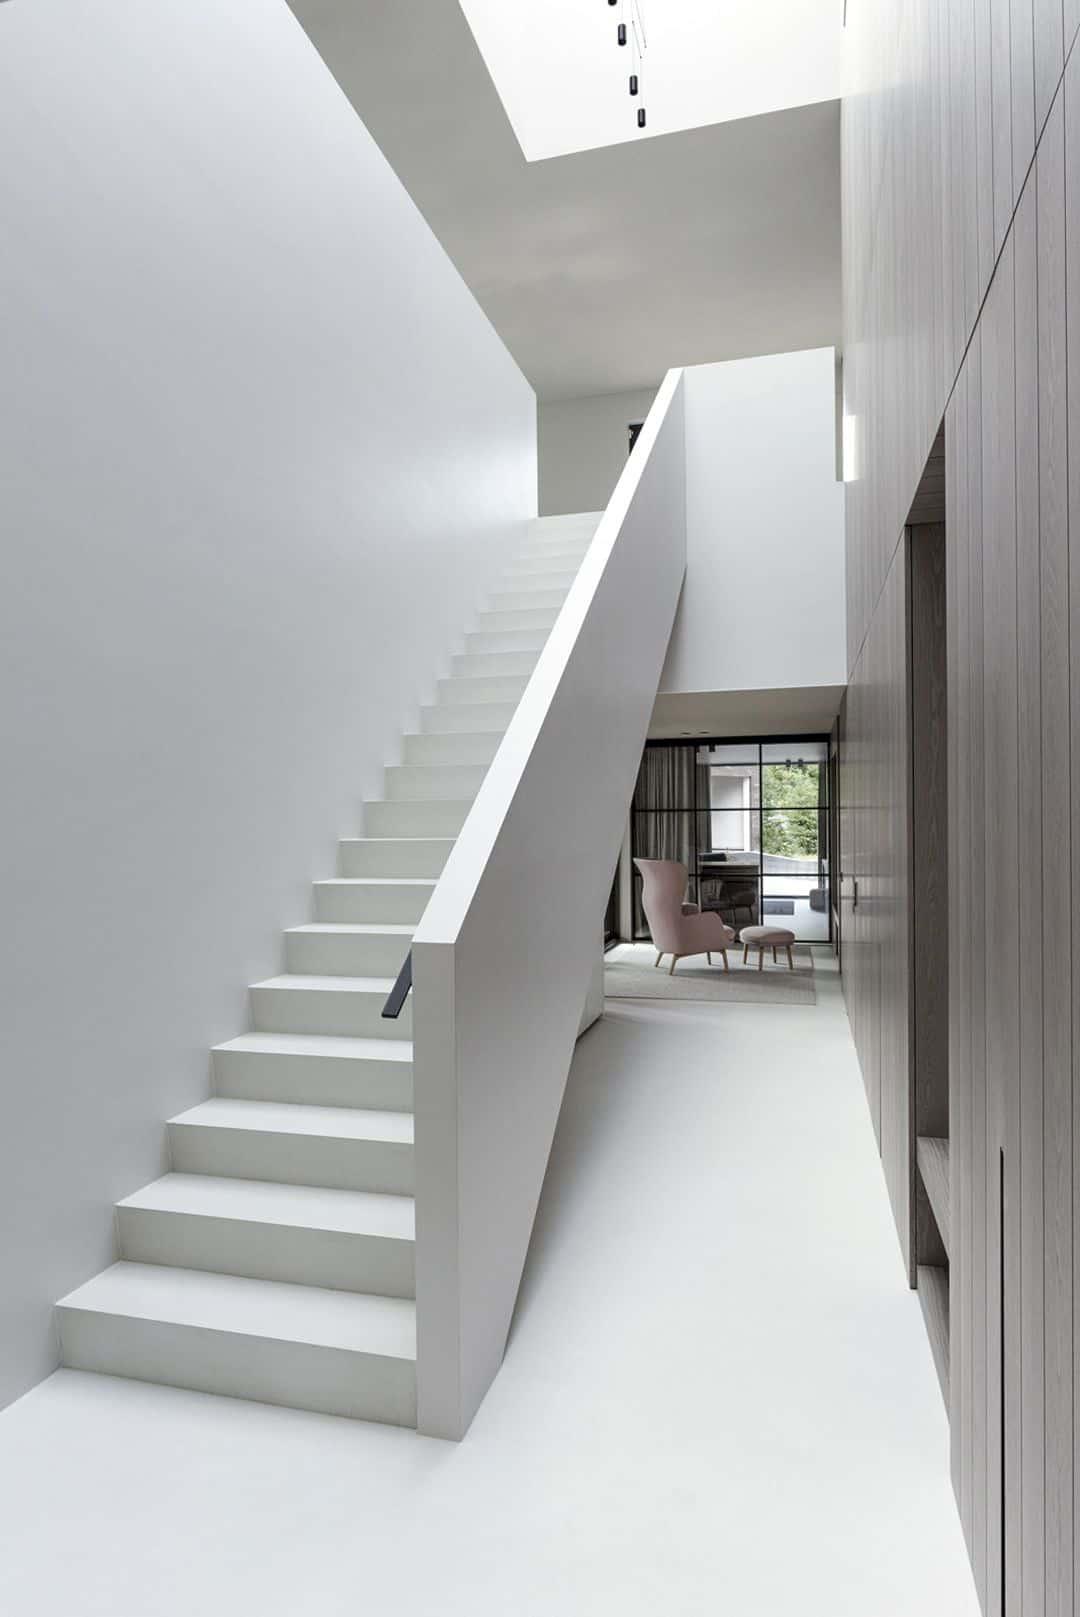 Matchbox Houses By Avanto Architects 1